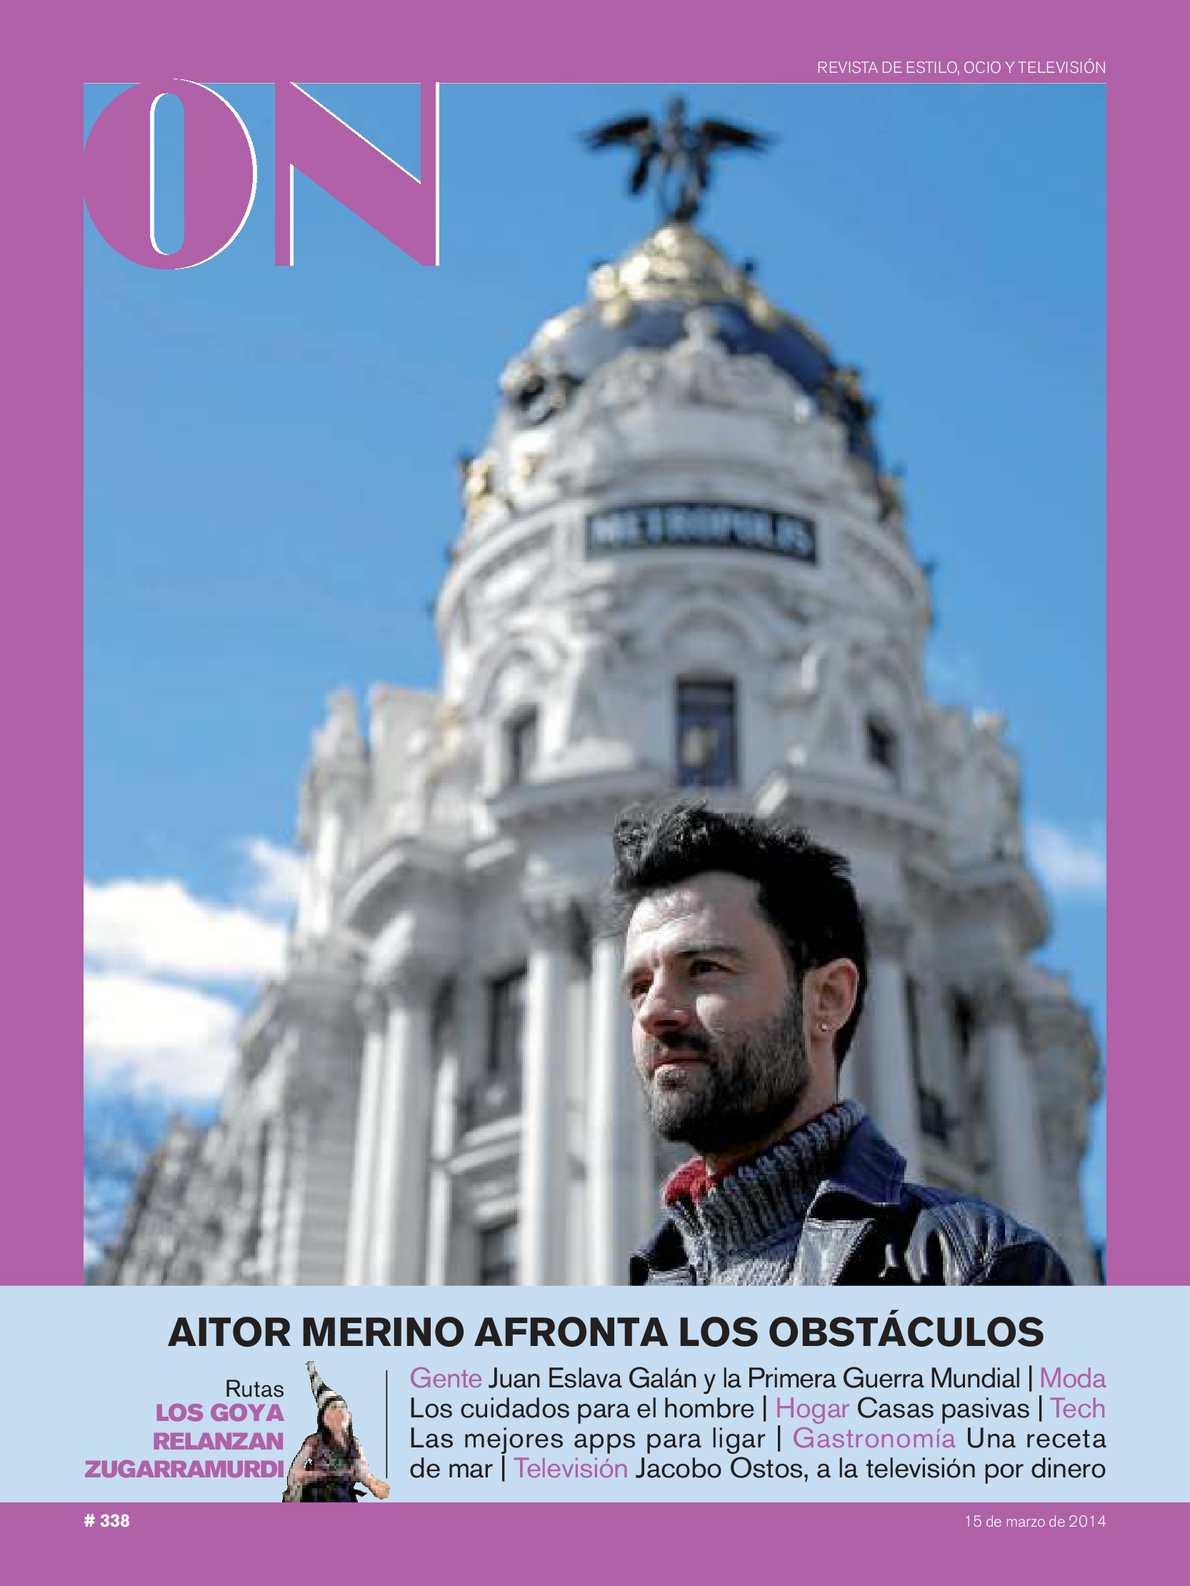 03bcd60b8a On Y De Revista Calaméo Estilo Ocio 20140315 EHY2DW9I